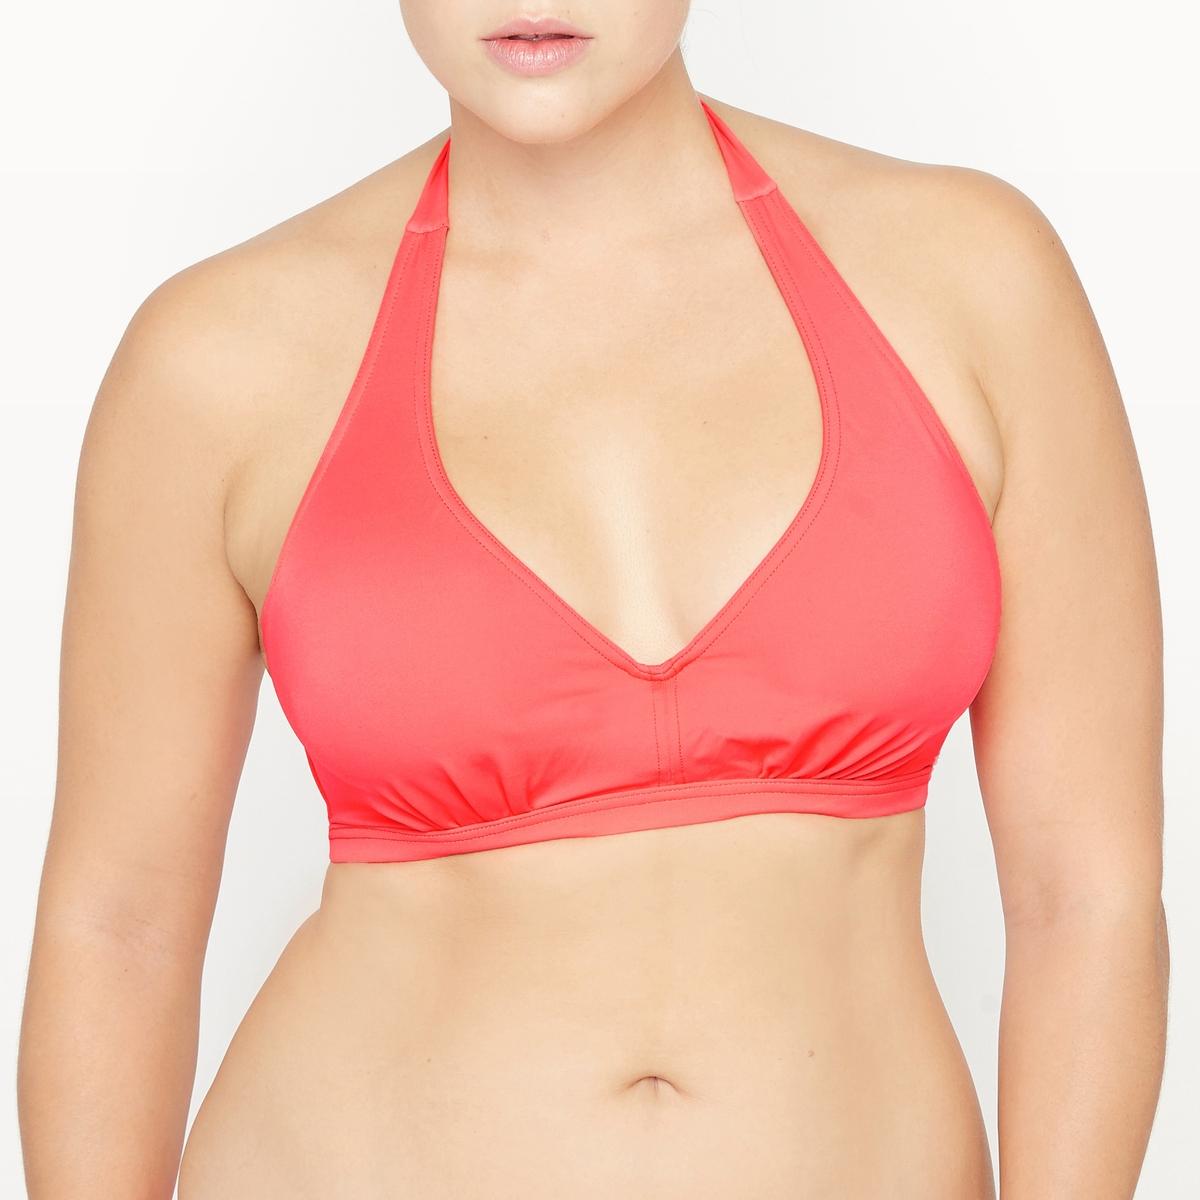 цена Бюстгальтер-фуляр La Redoute От купальника 90 E (FR) - 75 E (RUS) оранжевый онлайн в 2017 году